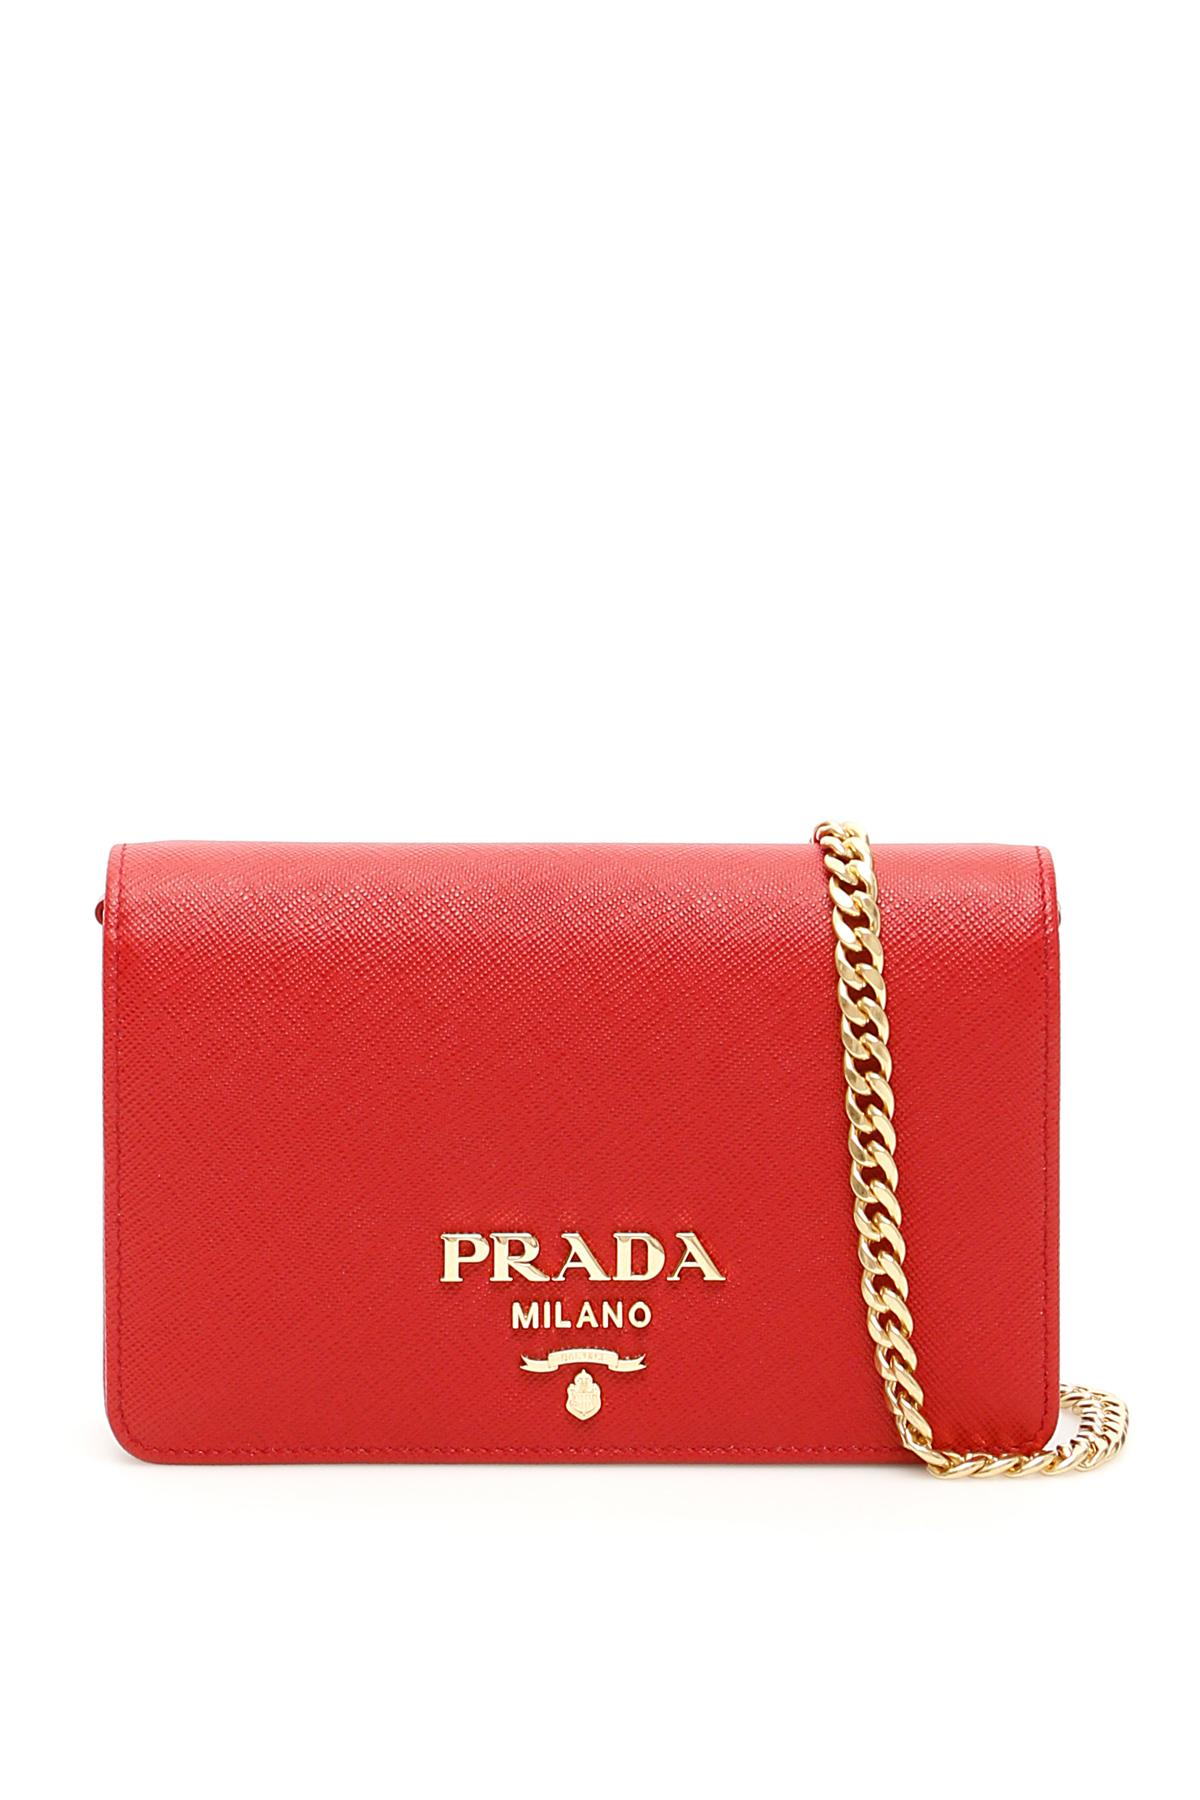 6ef236b31d4 Prada Bags for Women Philippines - Prada Womens Bags for sale ...